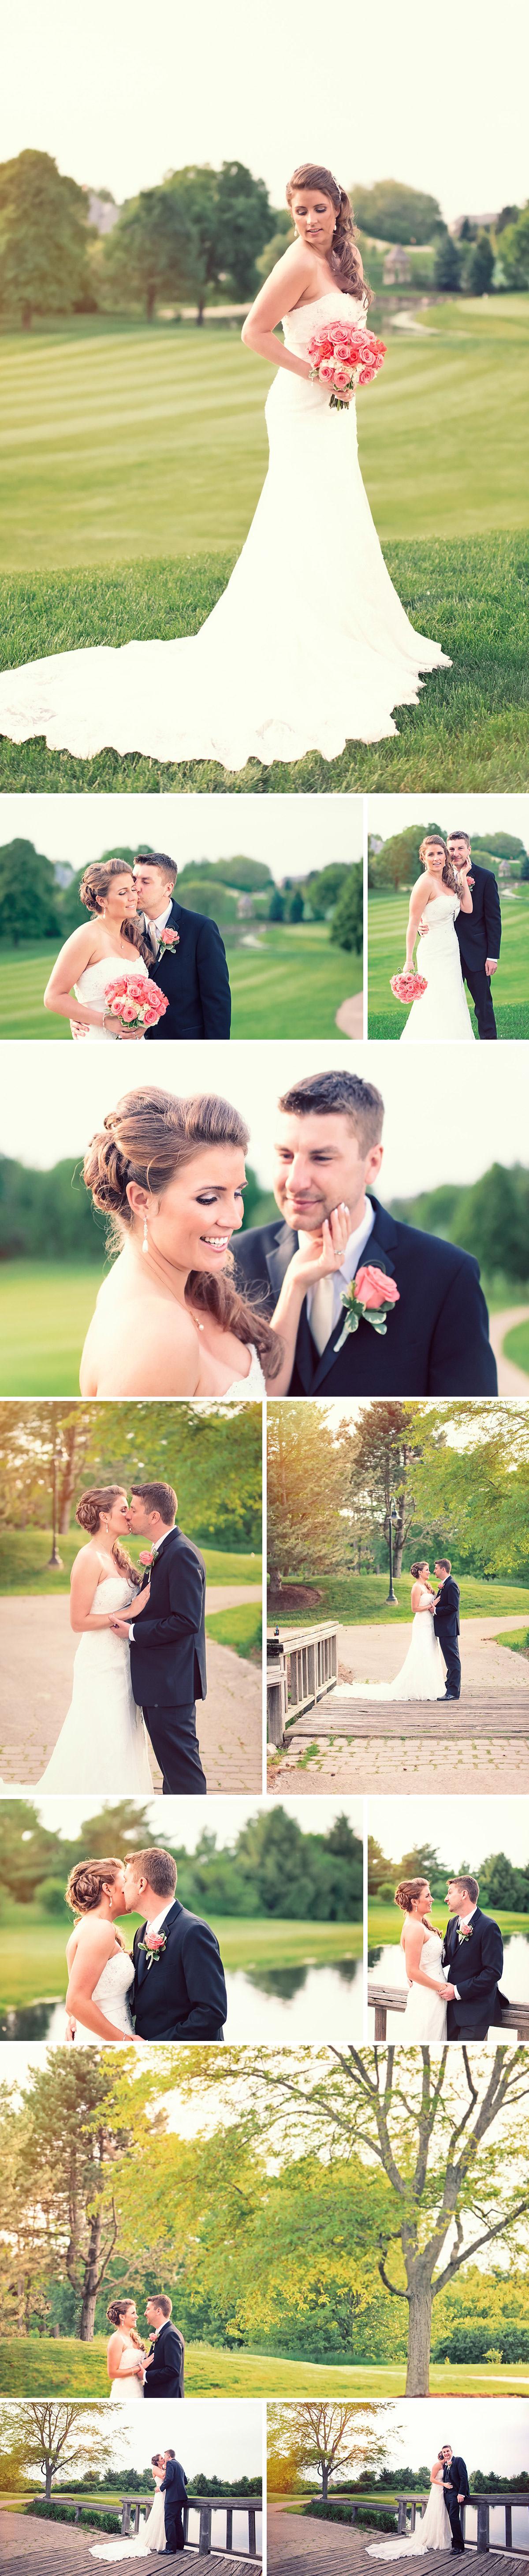 Chicago_Fine_Art_Wedding_Photography_olson5